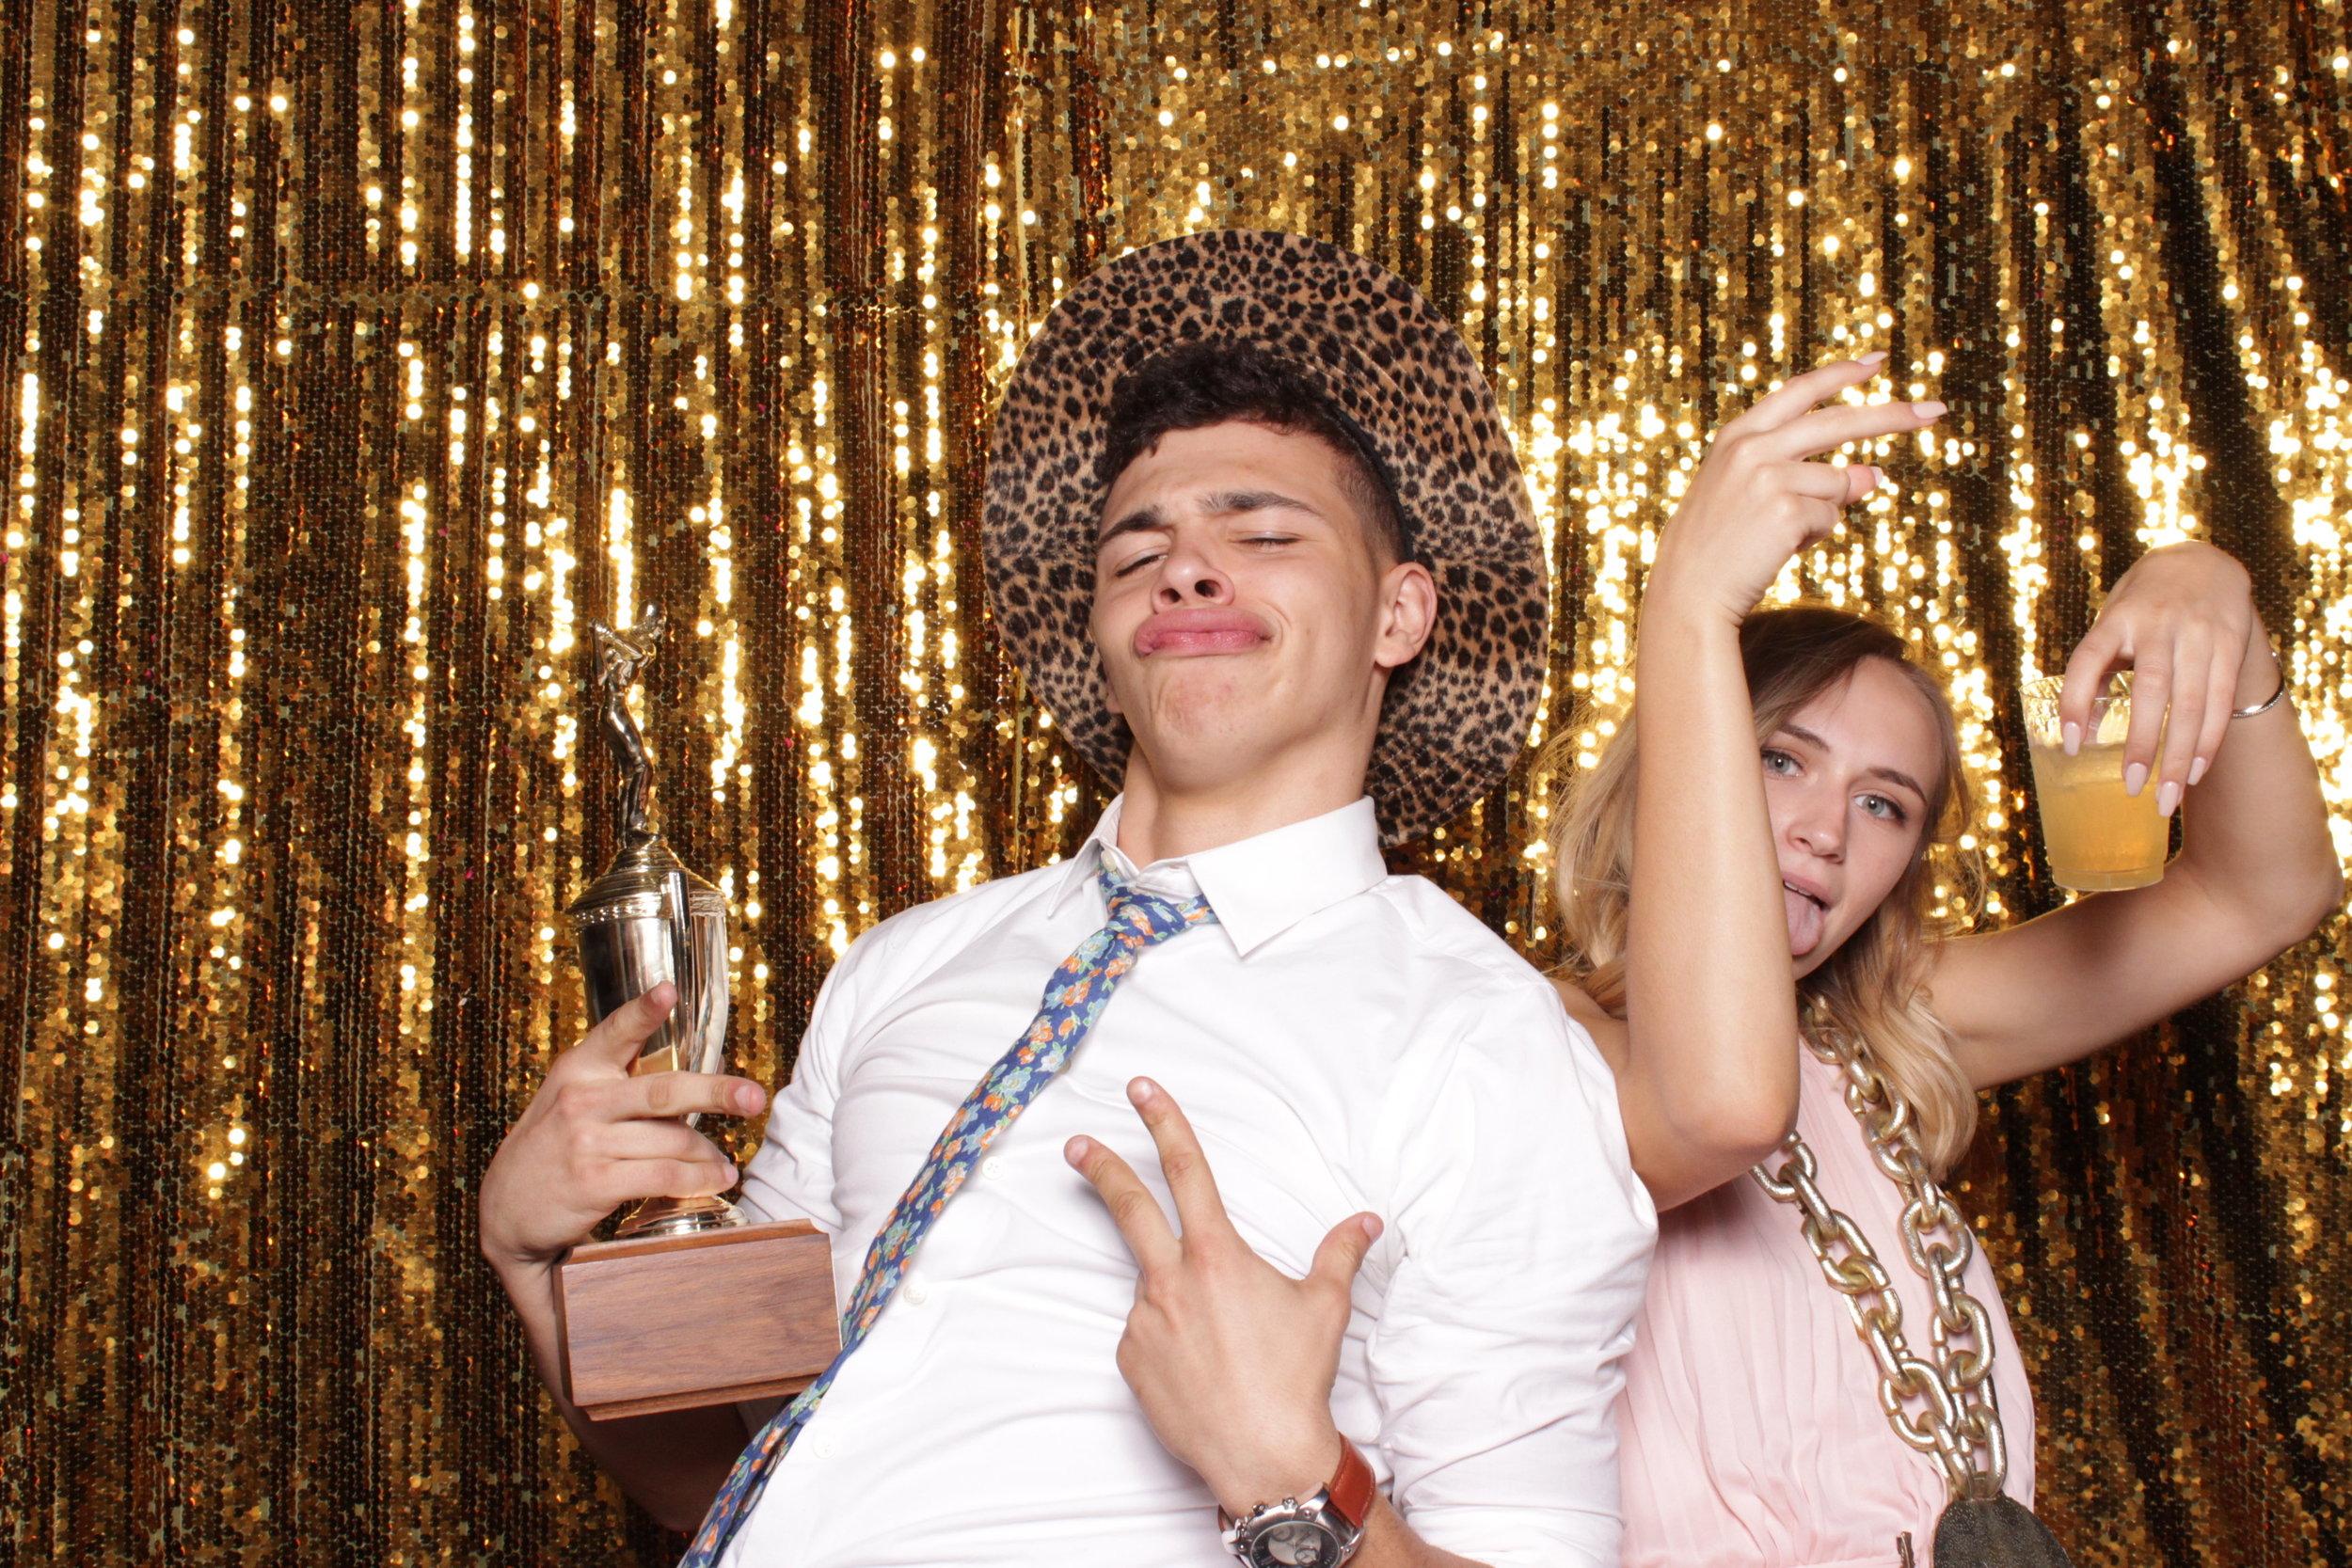 chico-wedding-photo-booth-rental-chyeah-bro